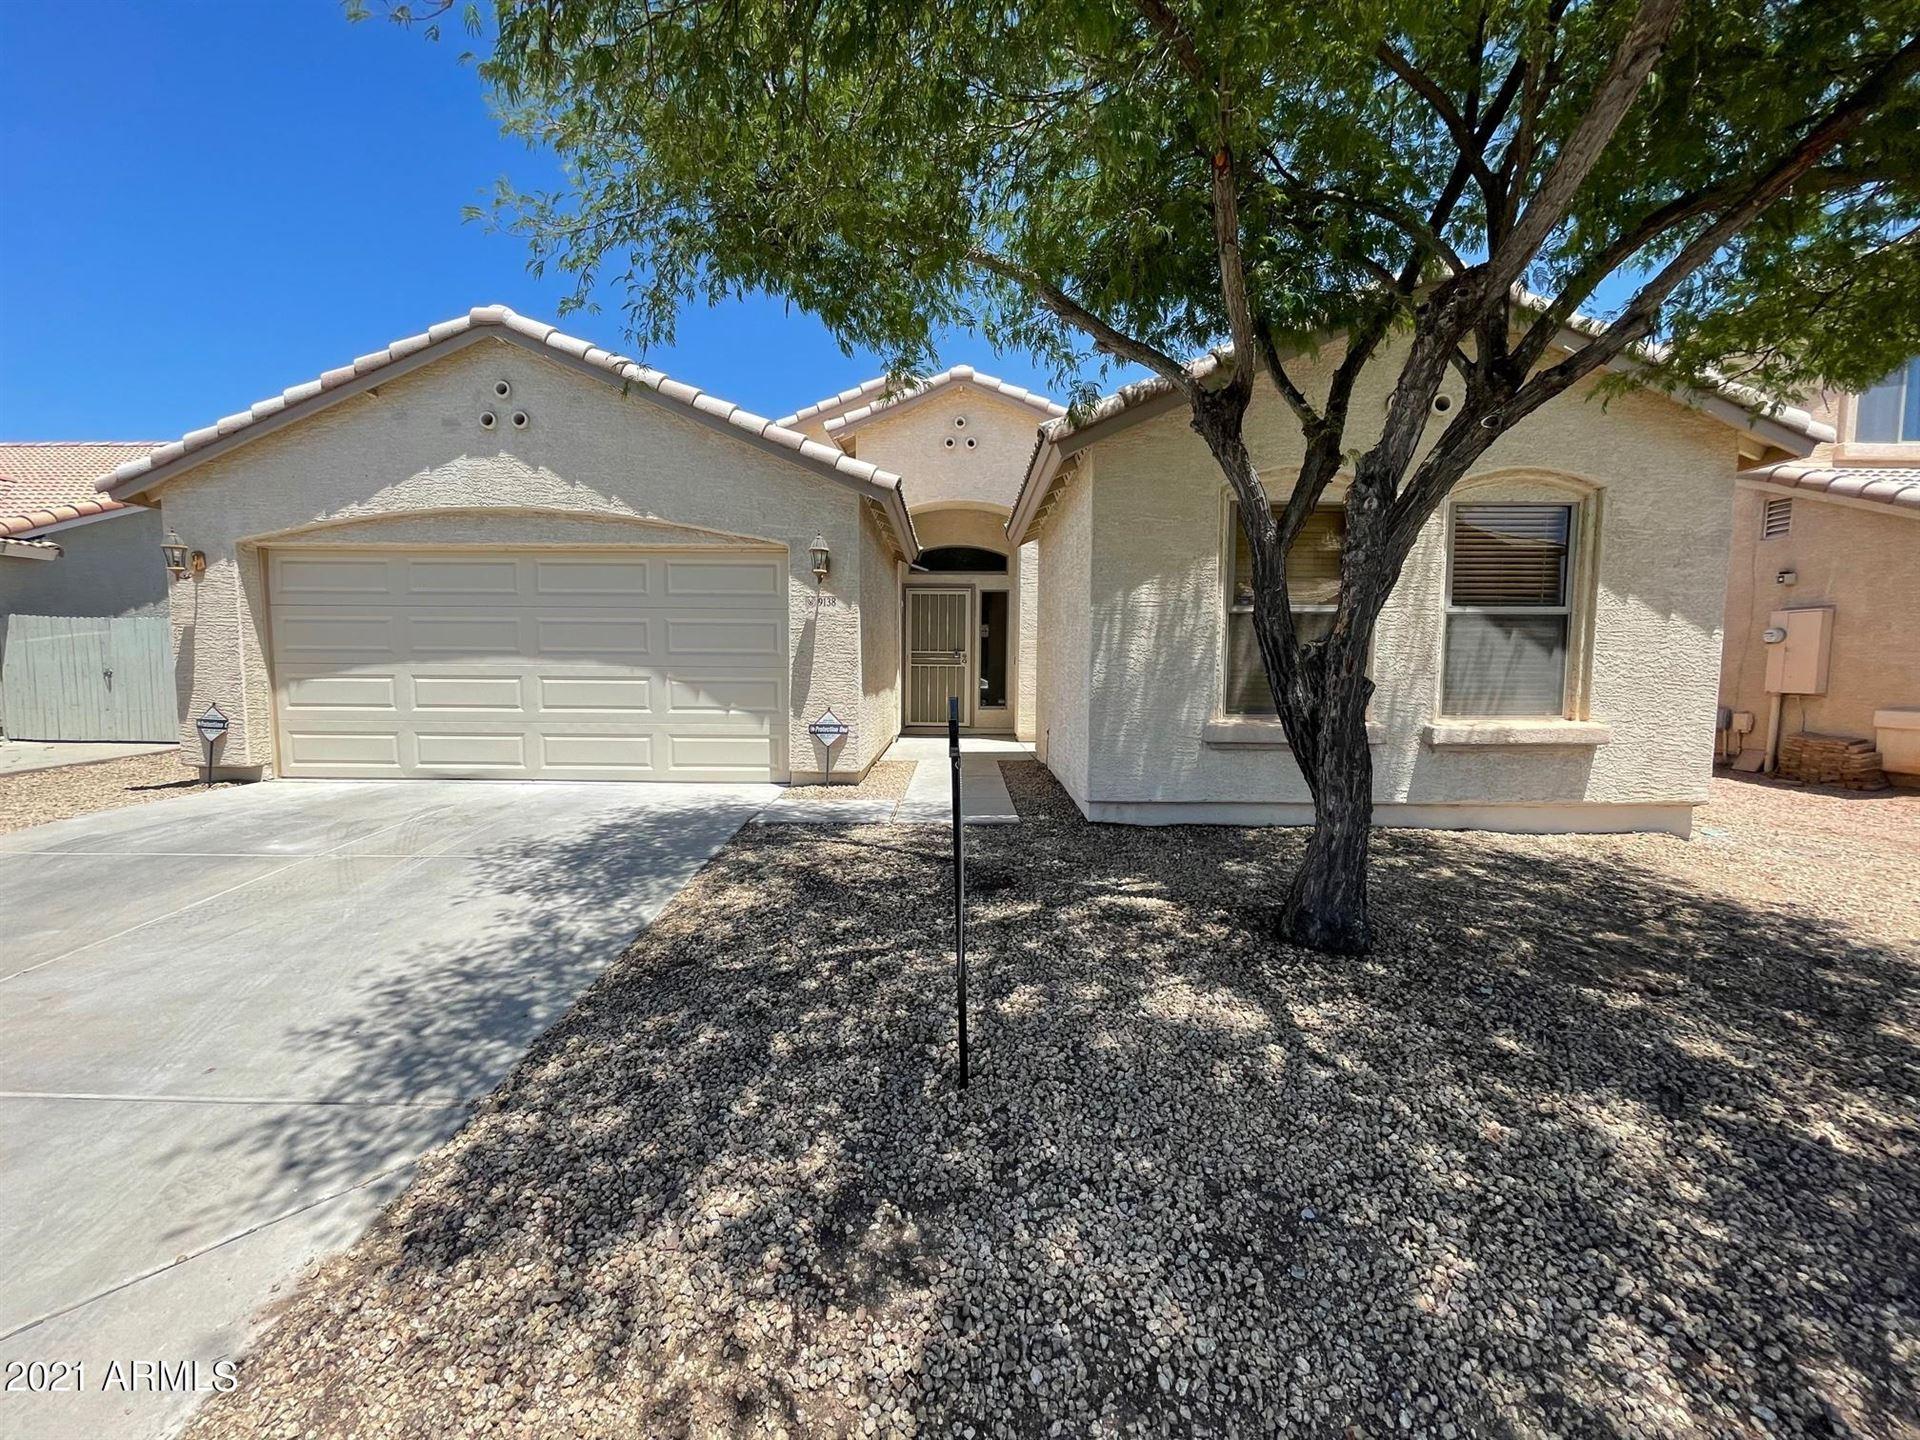 9138 W MACKENZIE Drive, Phoenix, AZ 85037 - MLS#: 6245251